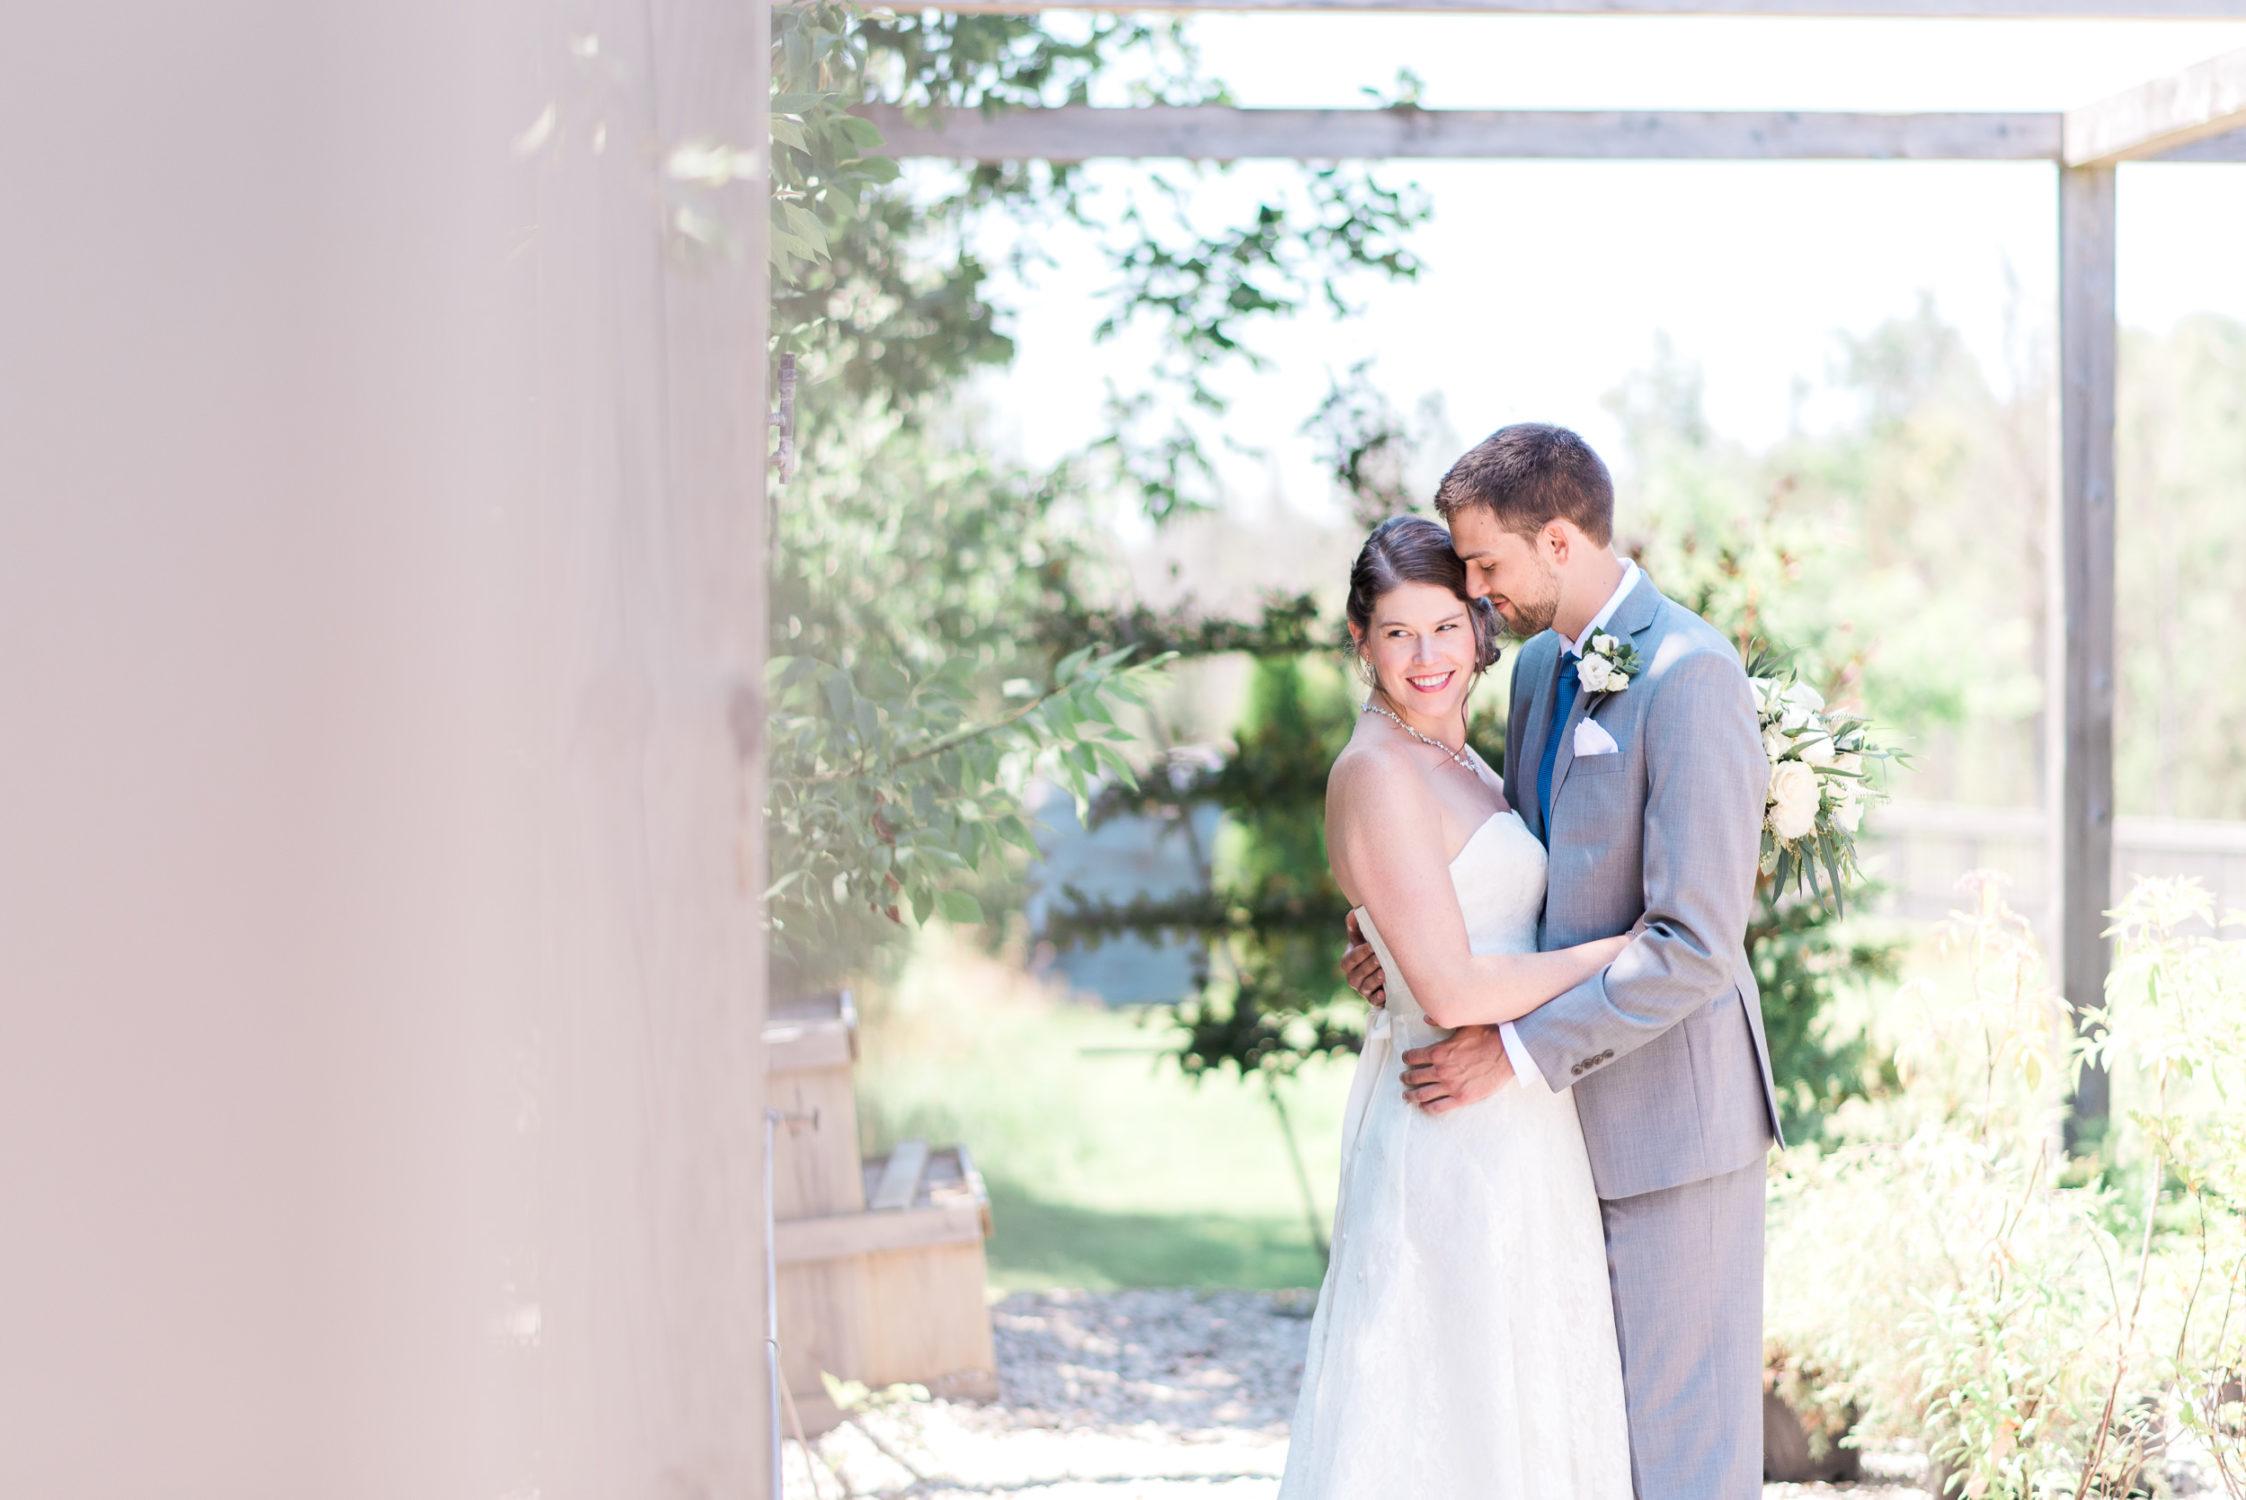 Ottawa wedding photographer, Hanover wedding at great landscapes